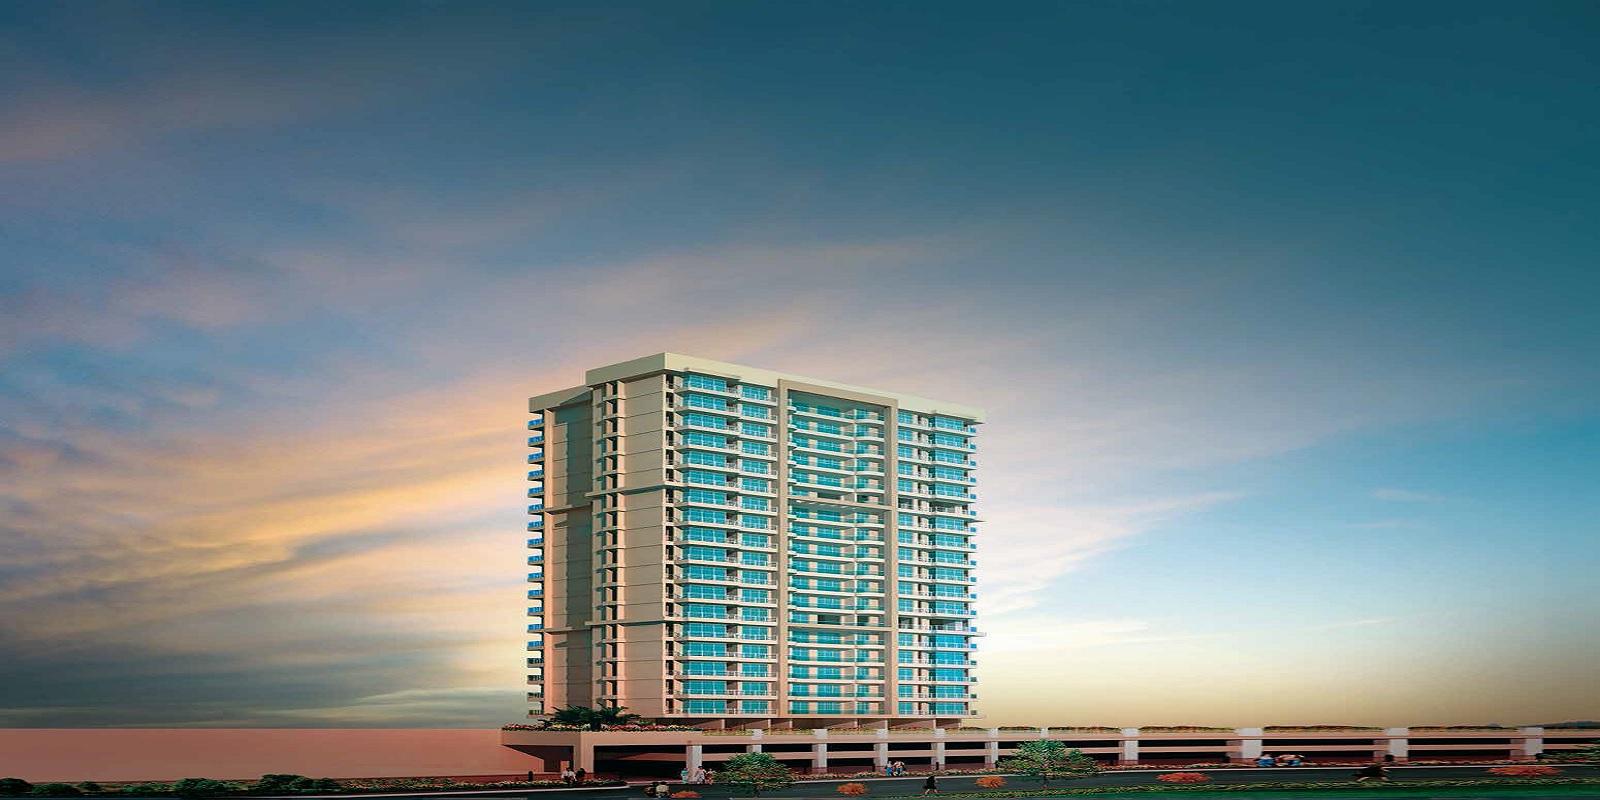 k raheja corp vistas mumbai project project large image1